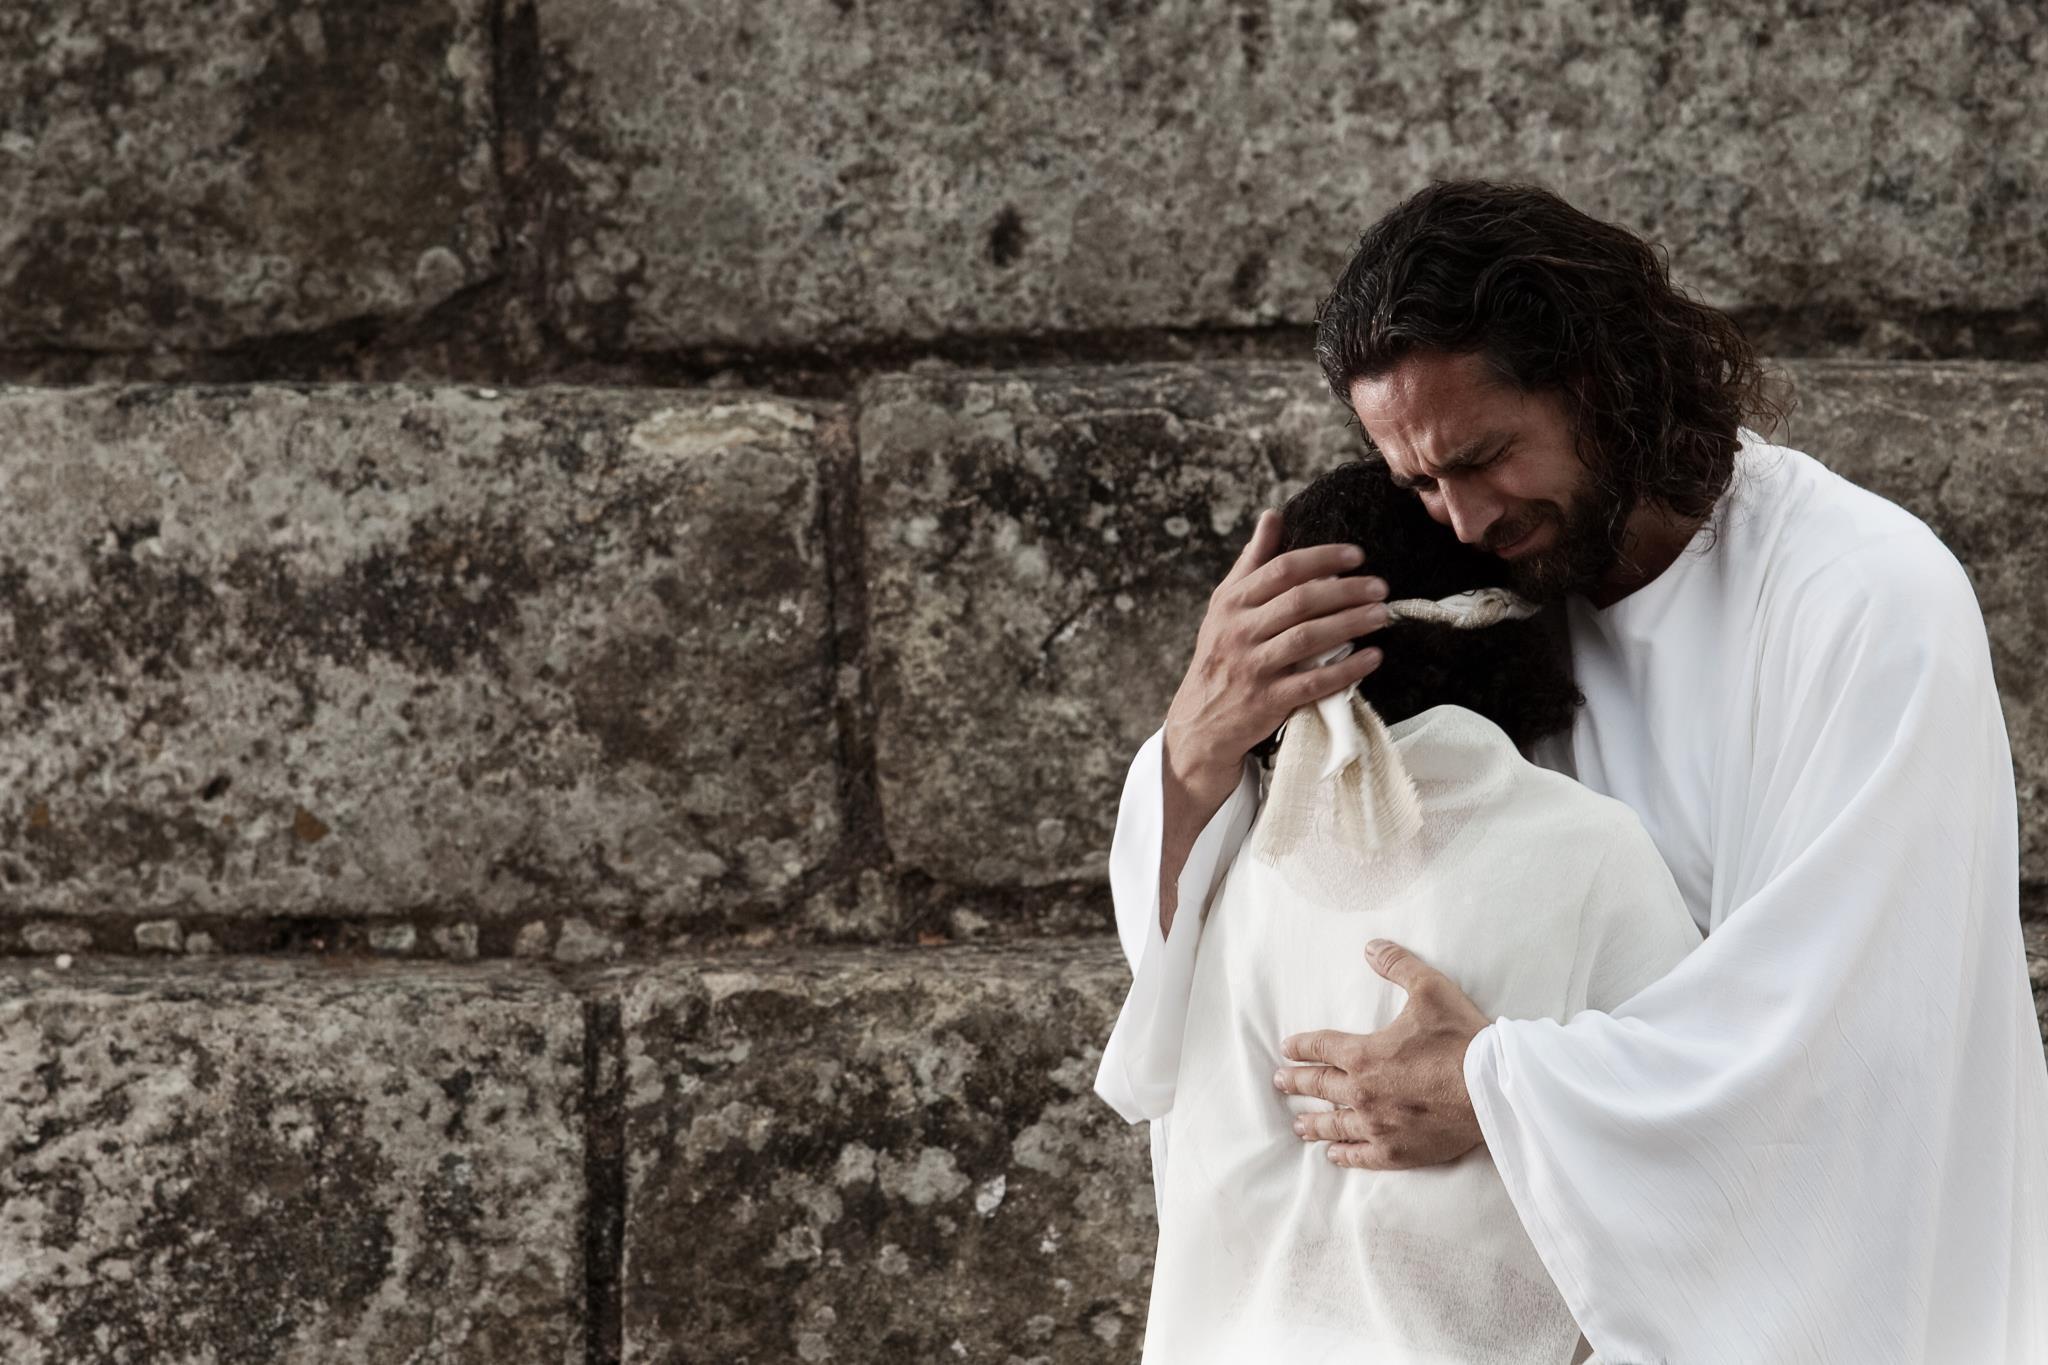 Праведник перед Богом во Христе